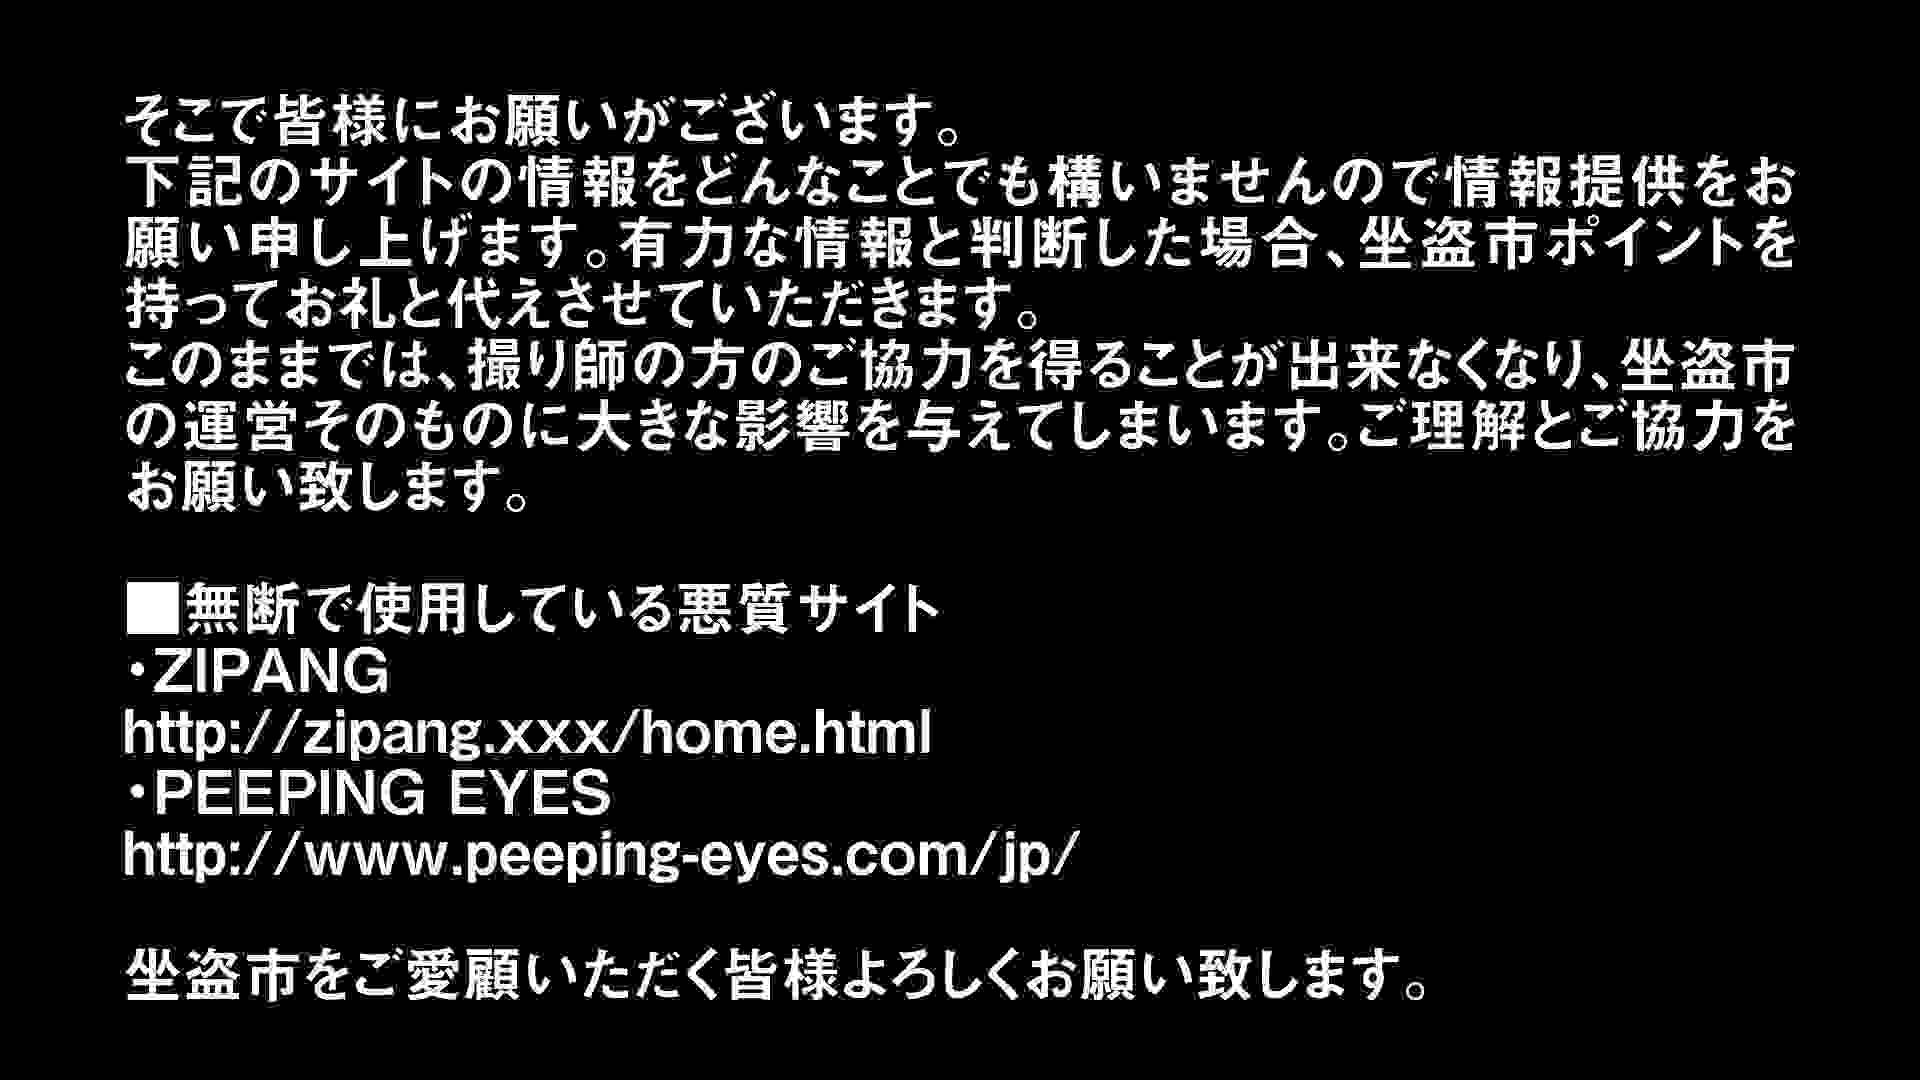 Aquaな露天風呂Vol.297 女体盗撮   OL女体  91連発 40